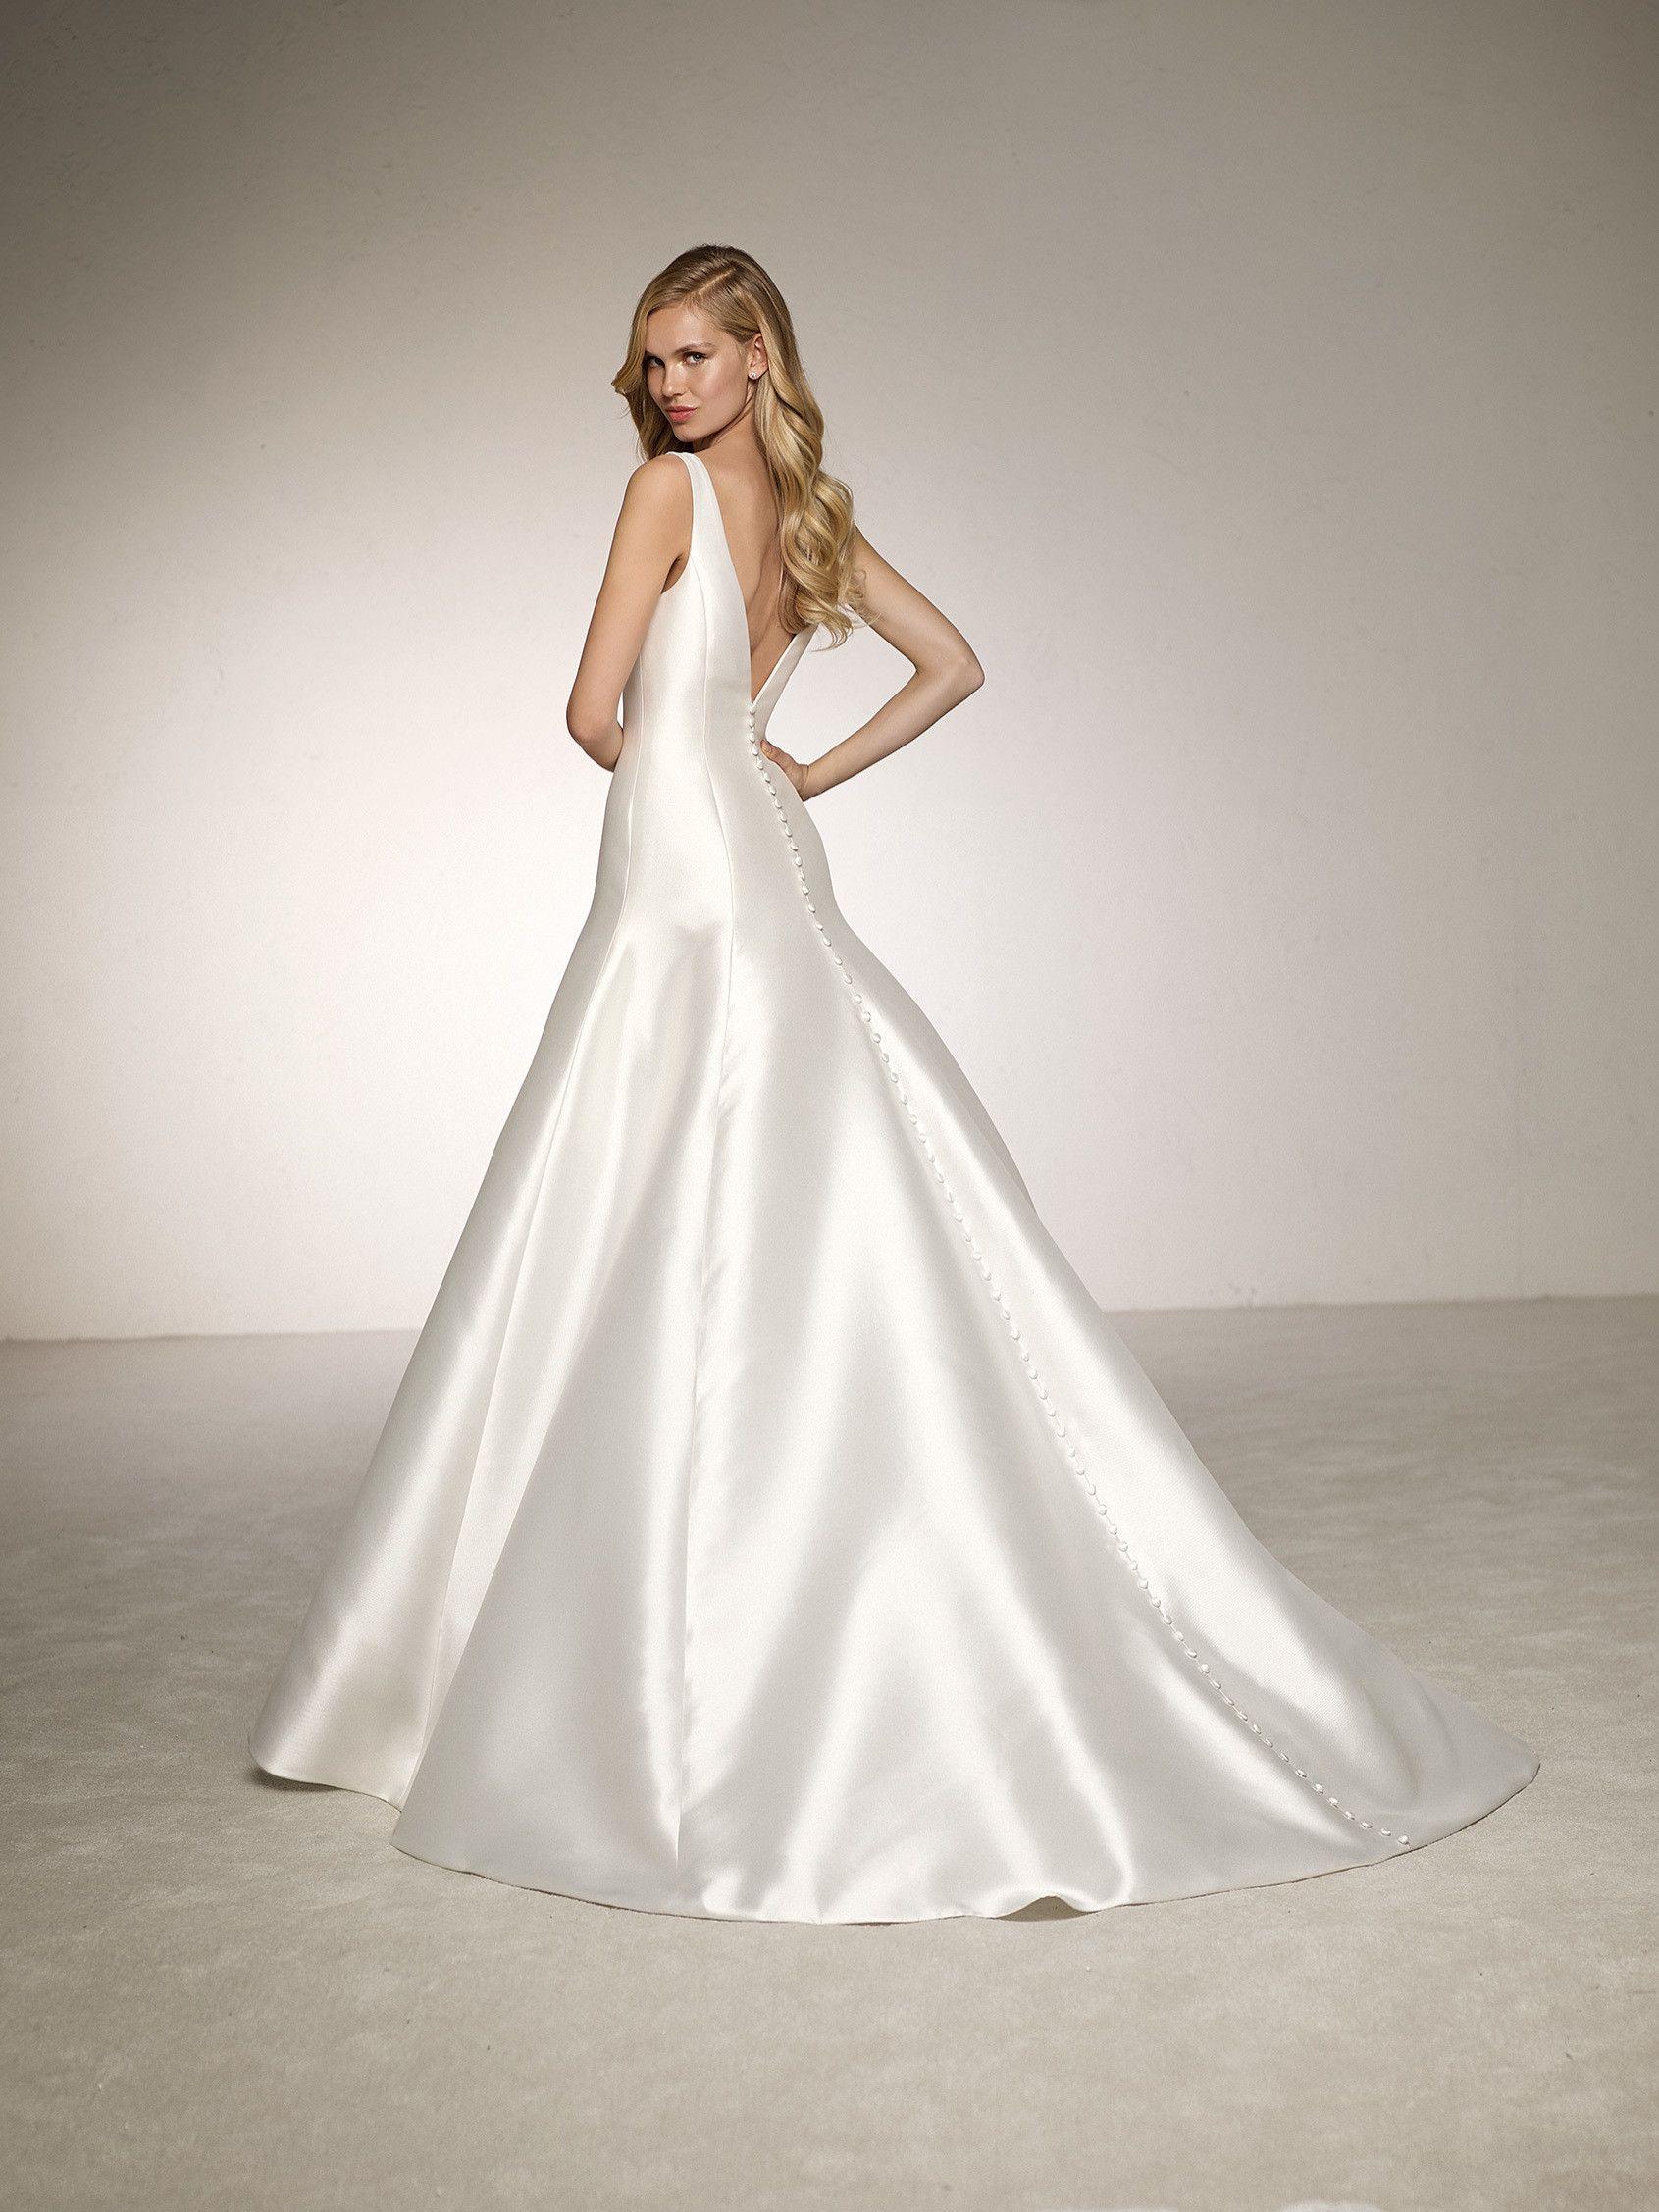 Vestidos de novia de falda